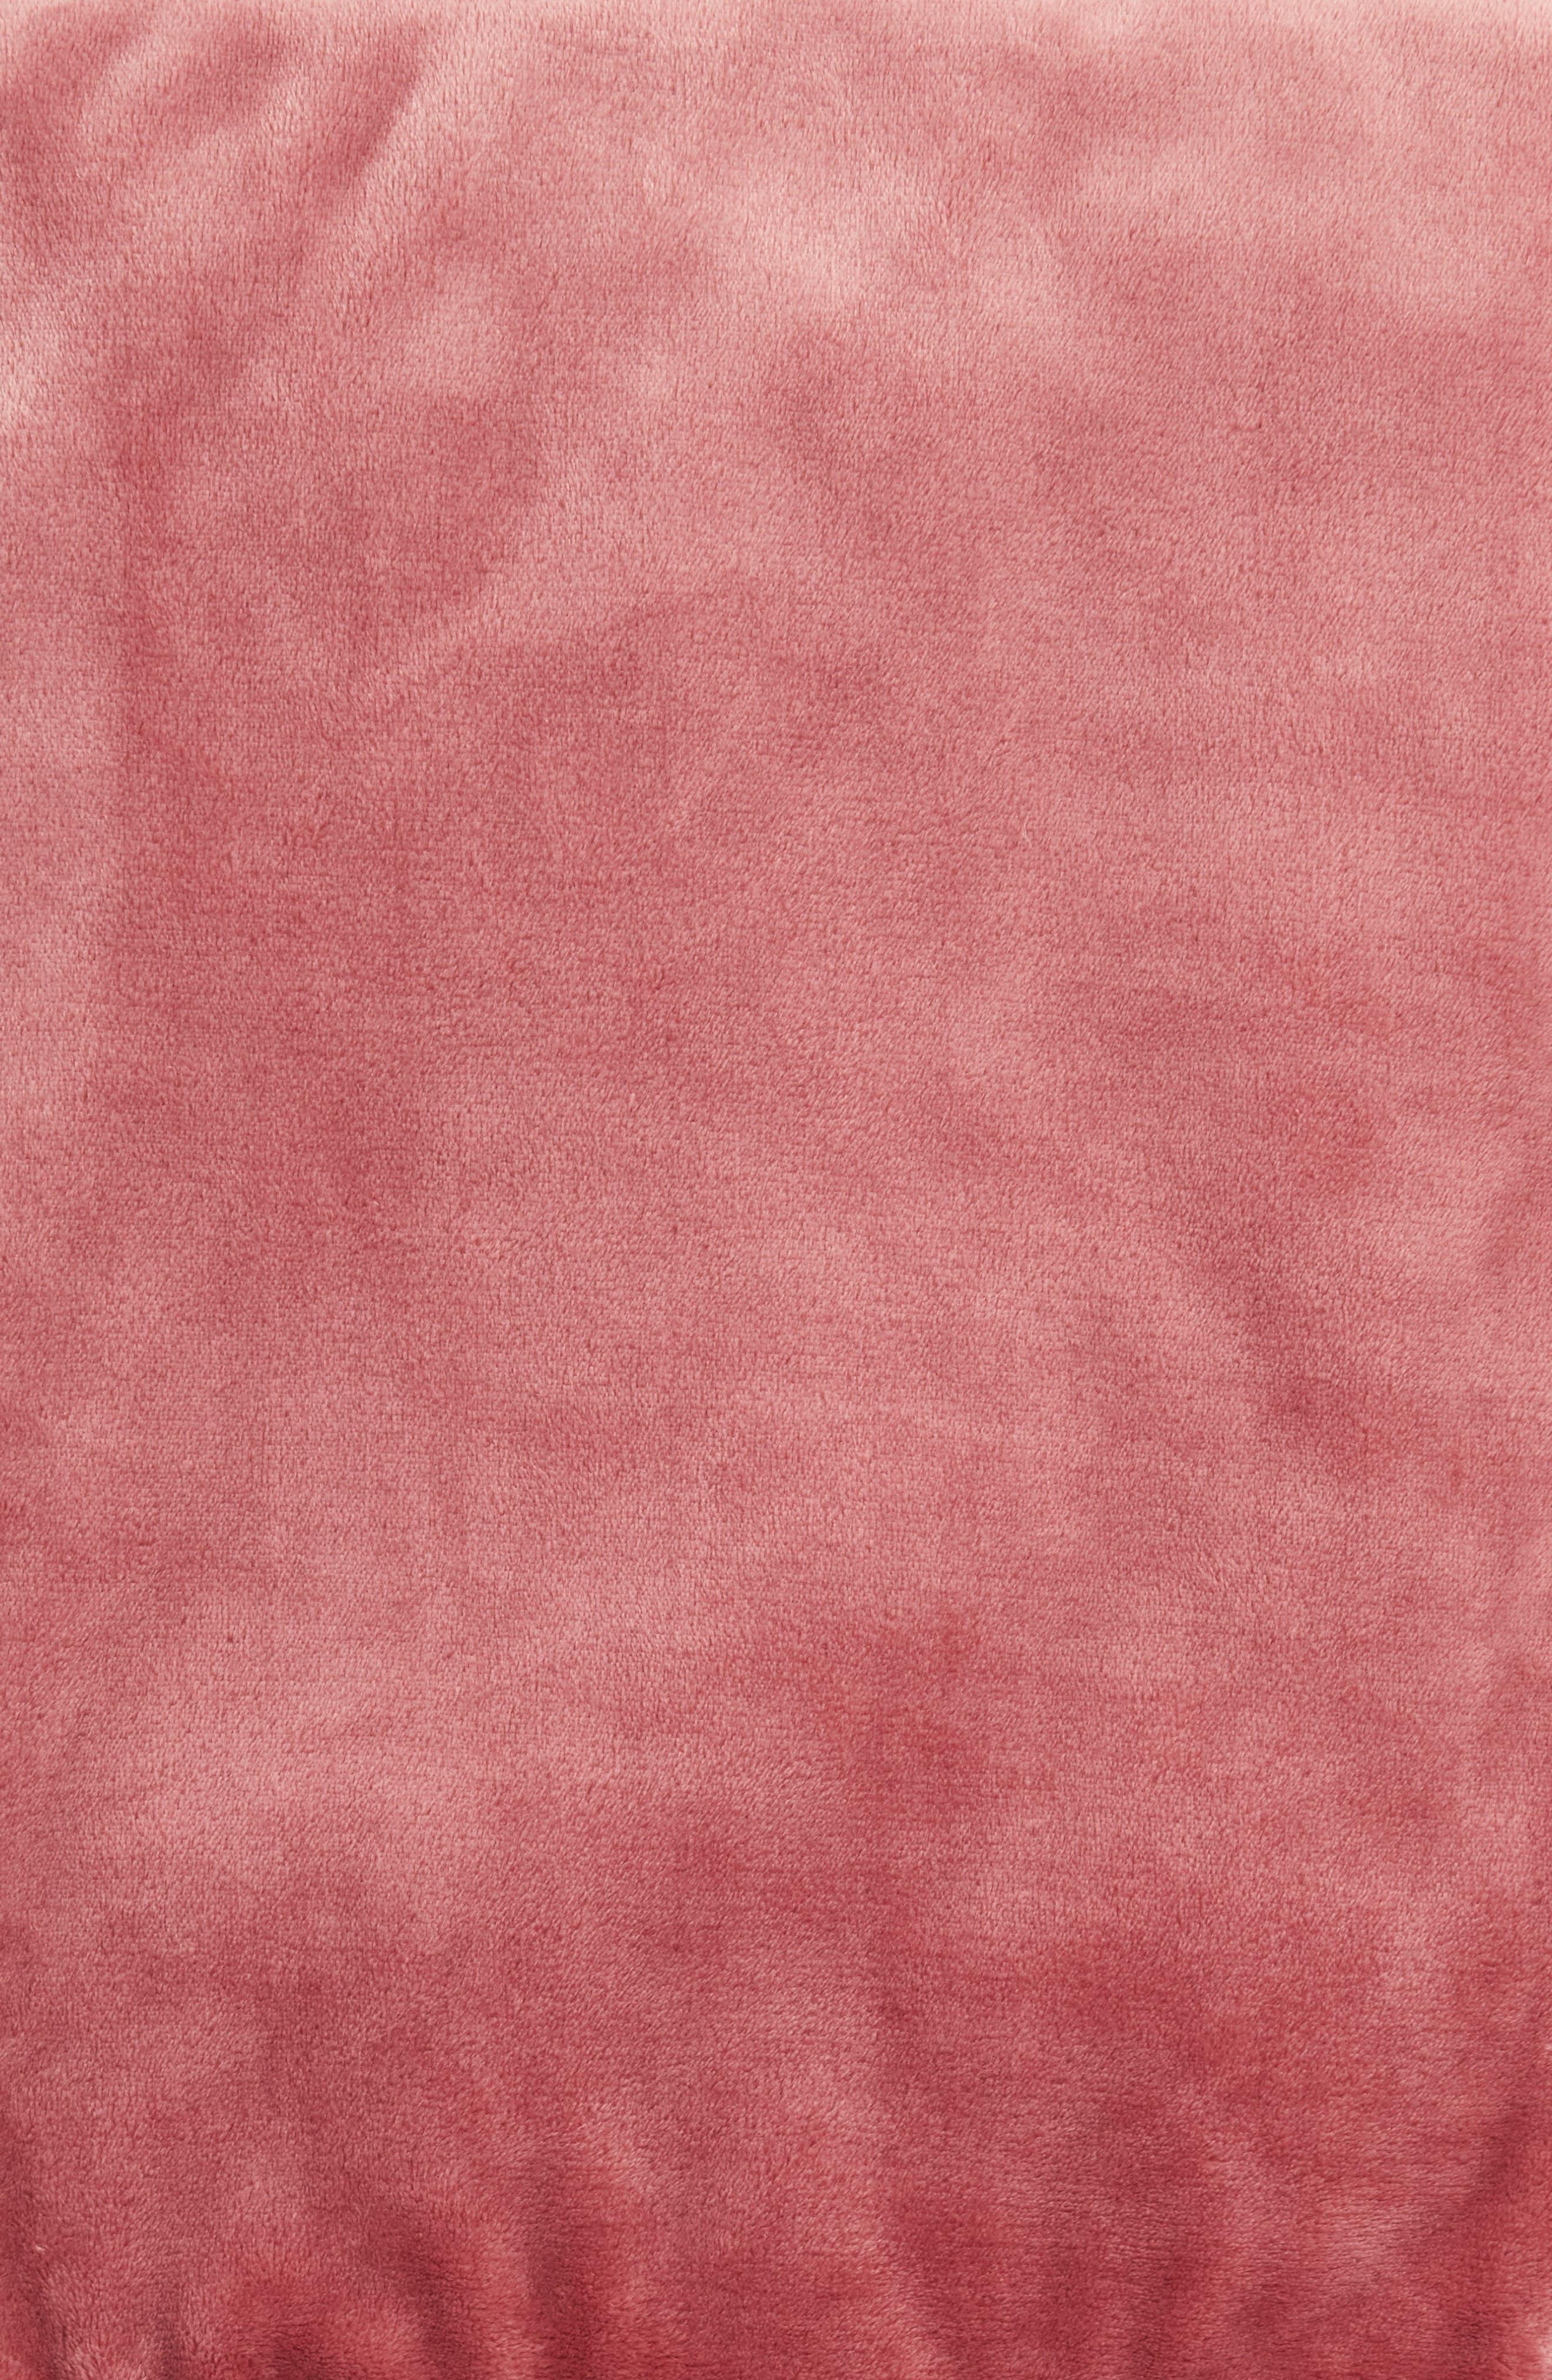 Alternate Image 2  - Kennebunk Home 'Bliss' Plush Throw